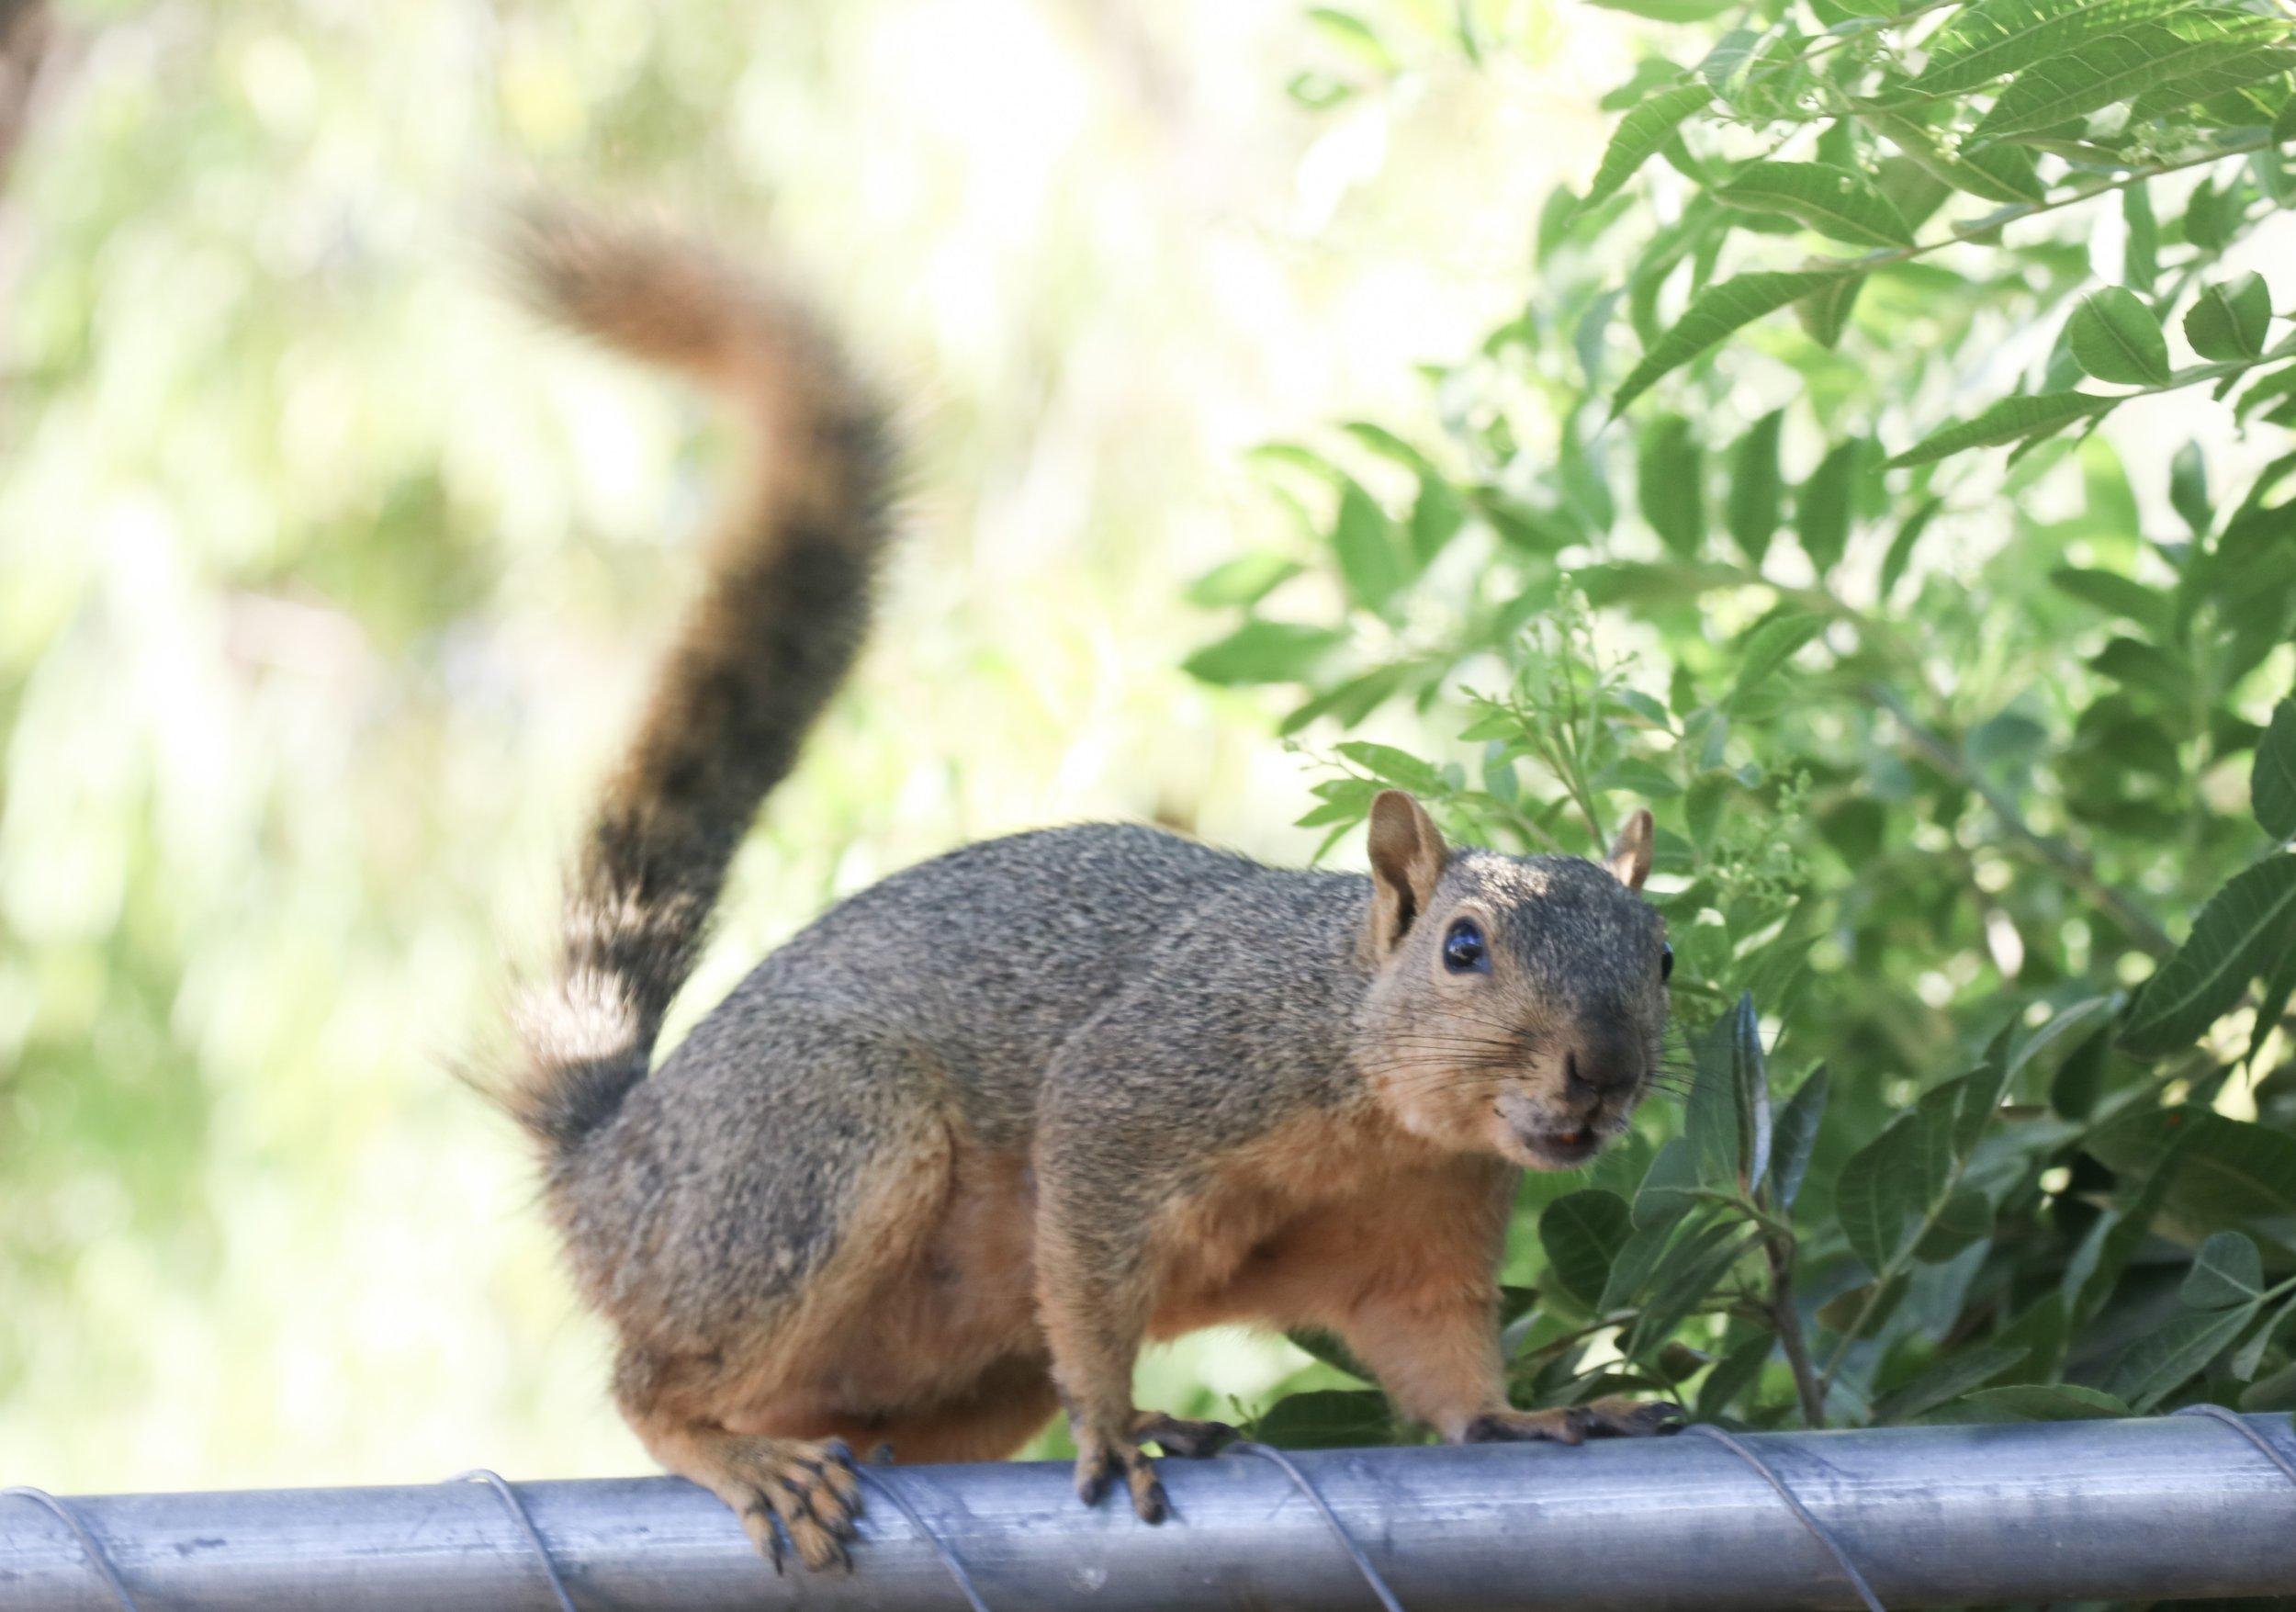 A squirrel enjoying its closeup.   Photo Credit: Lola Olvera